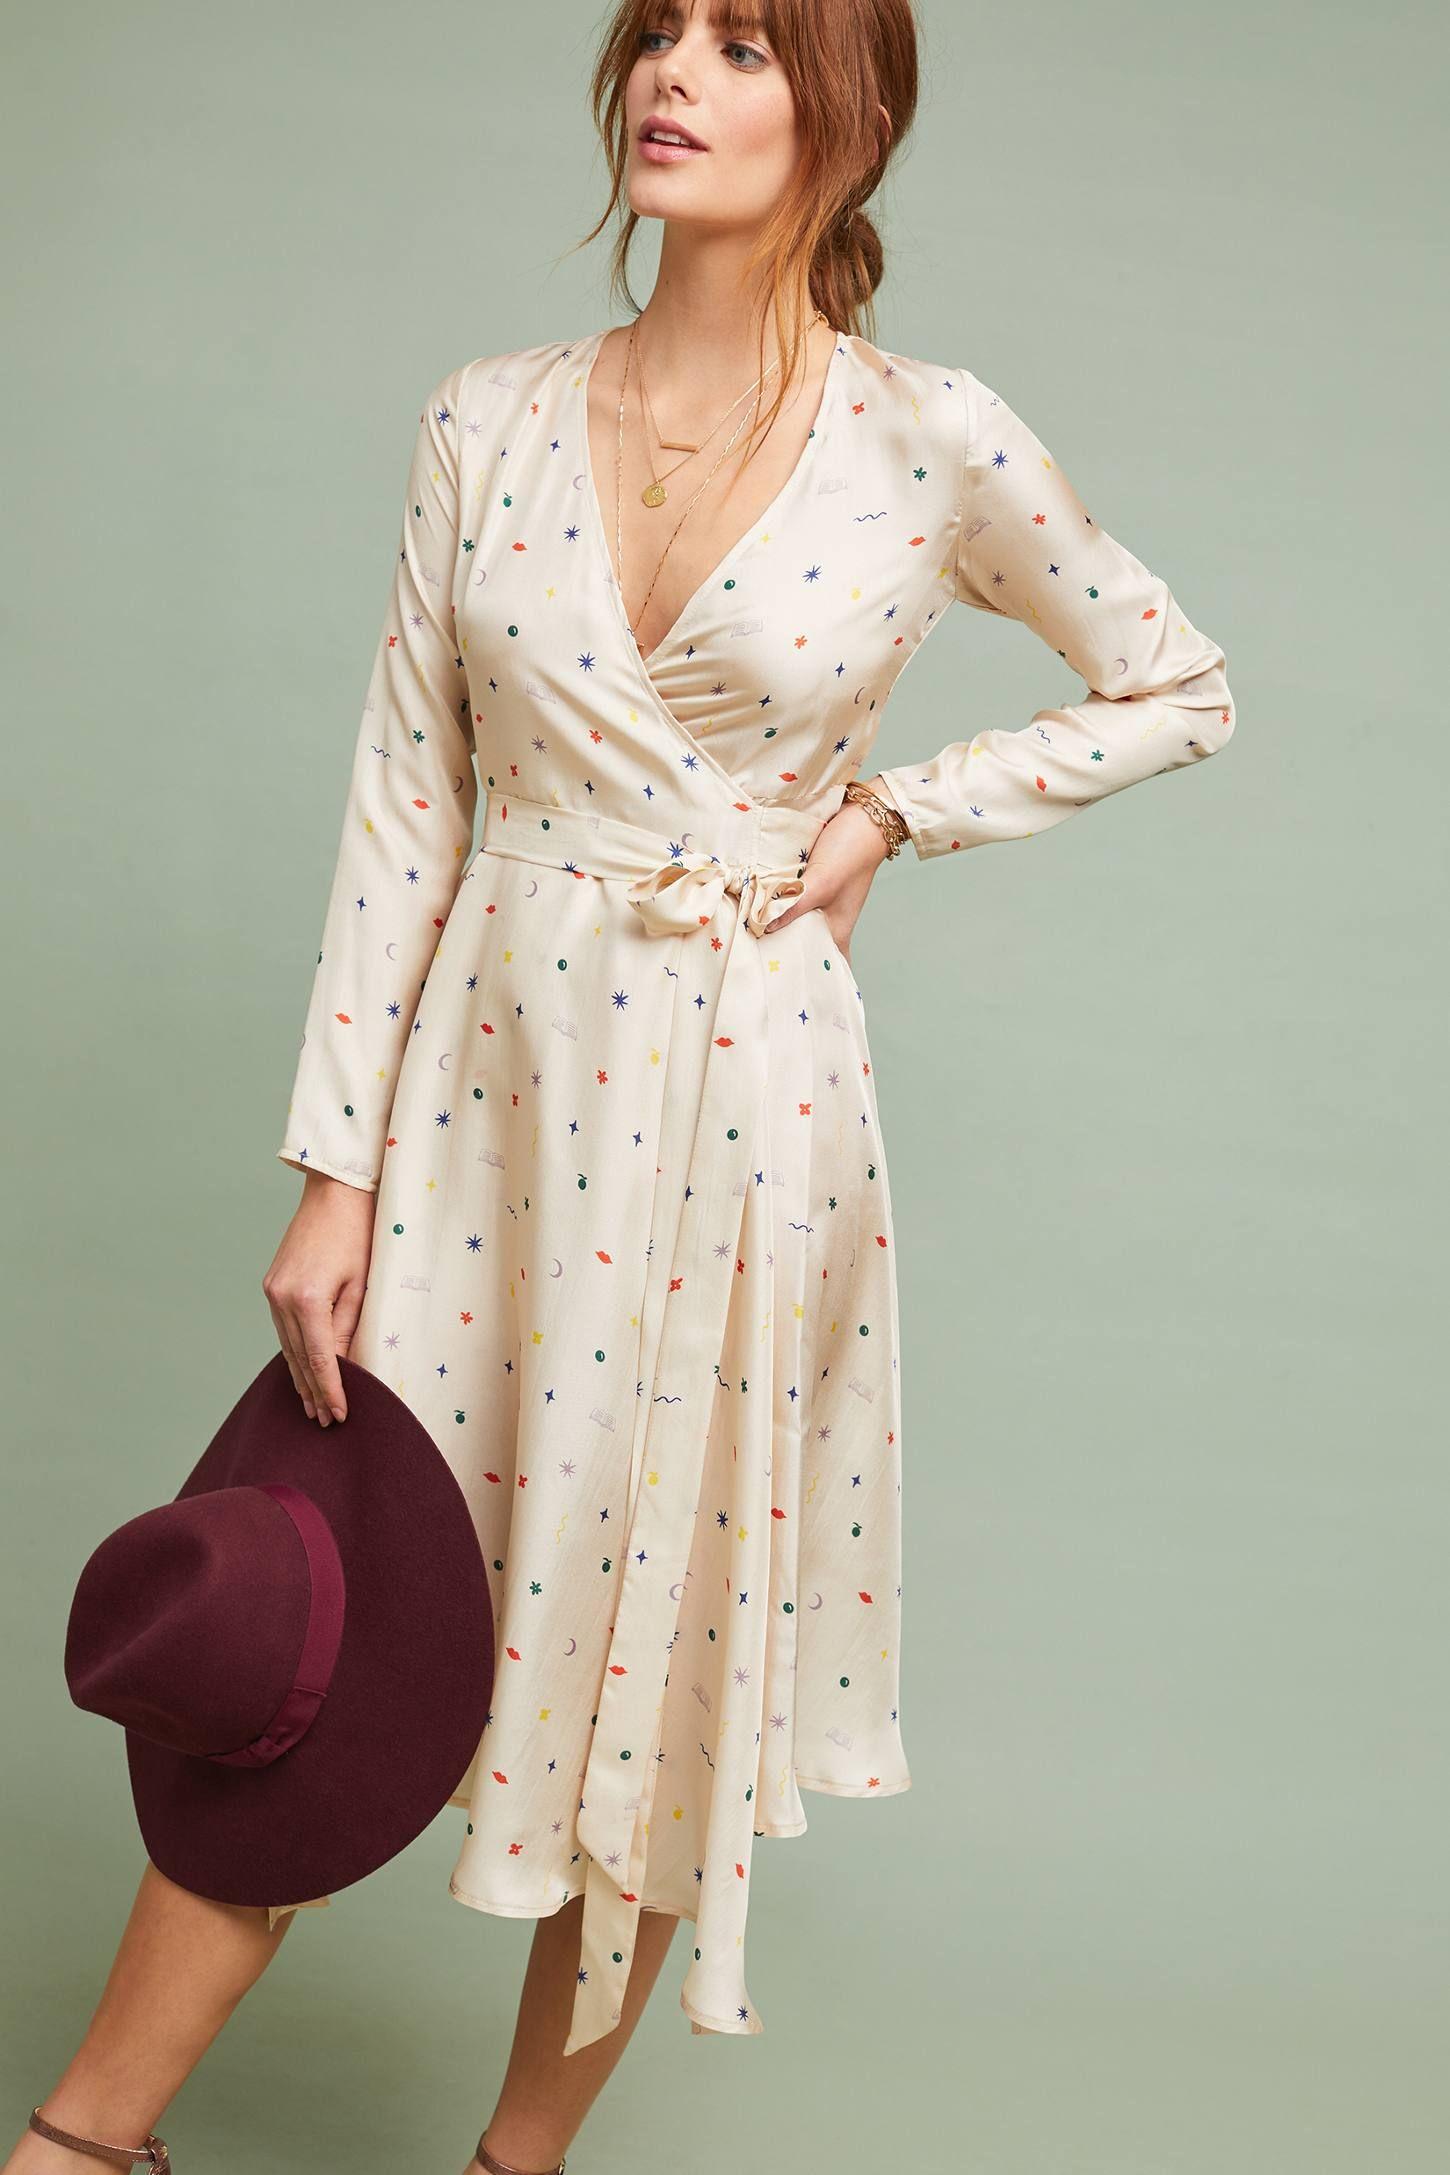 Minimalist Dress Vintage style dress Rachel Wrap Dress Silk Wrap Dress